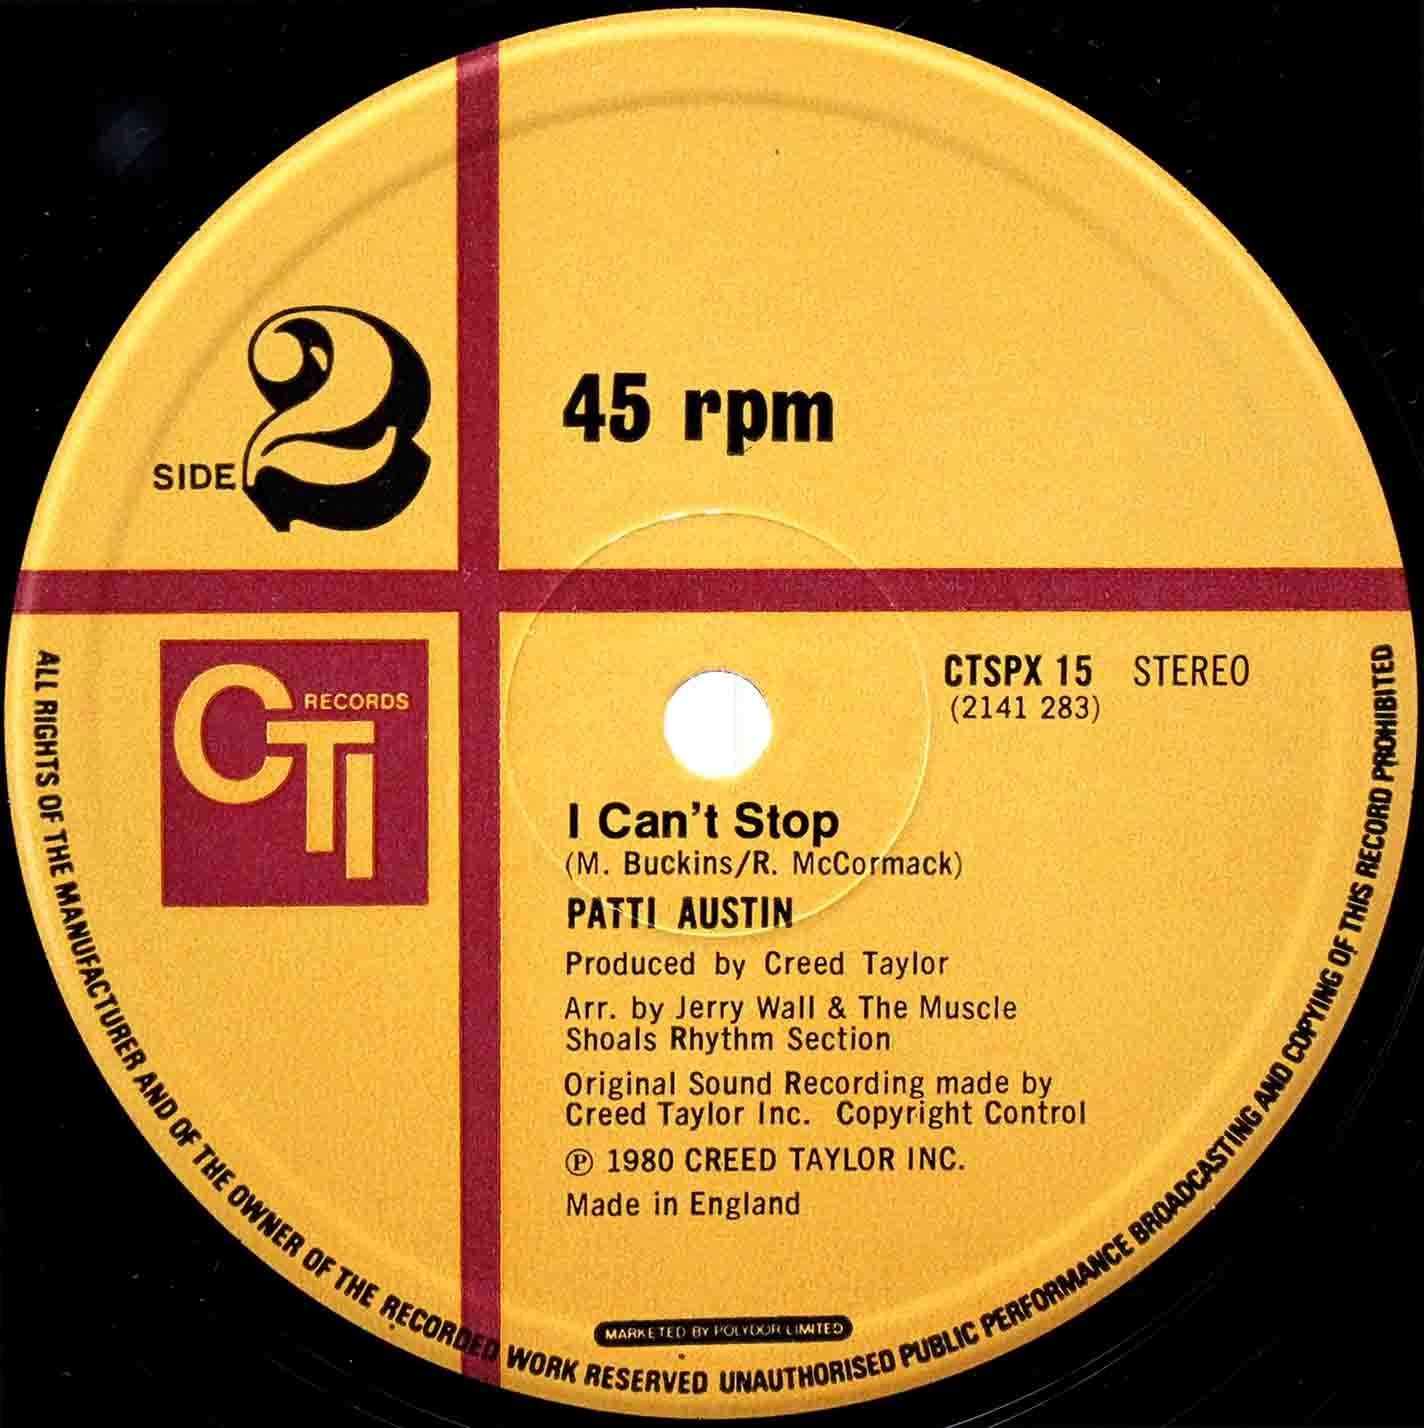 Patti Austin - People In Love 04